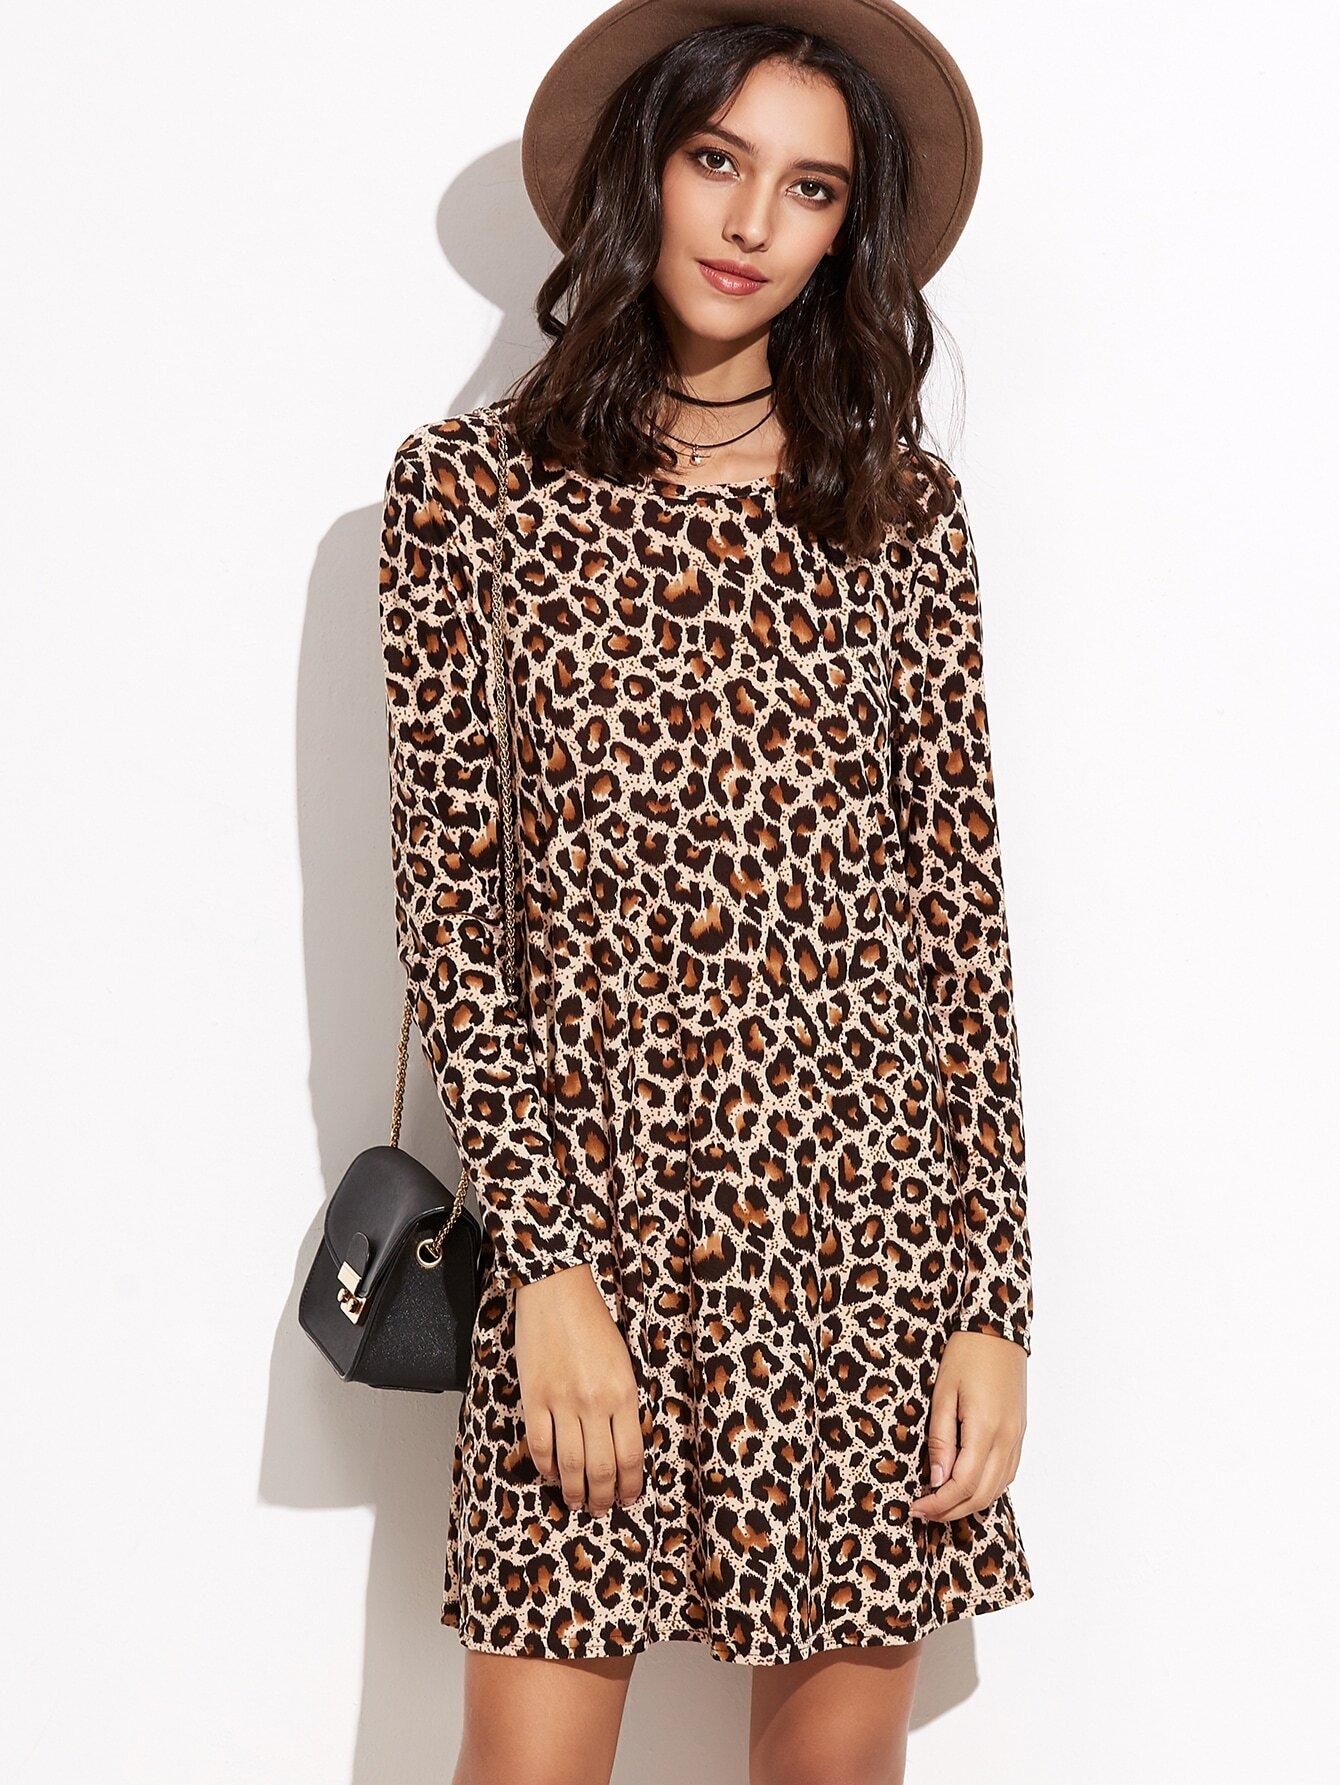 bef5126284a6 Leopard Print Shift Tee Dress EmmaCloth-Women Fast Fashion Online